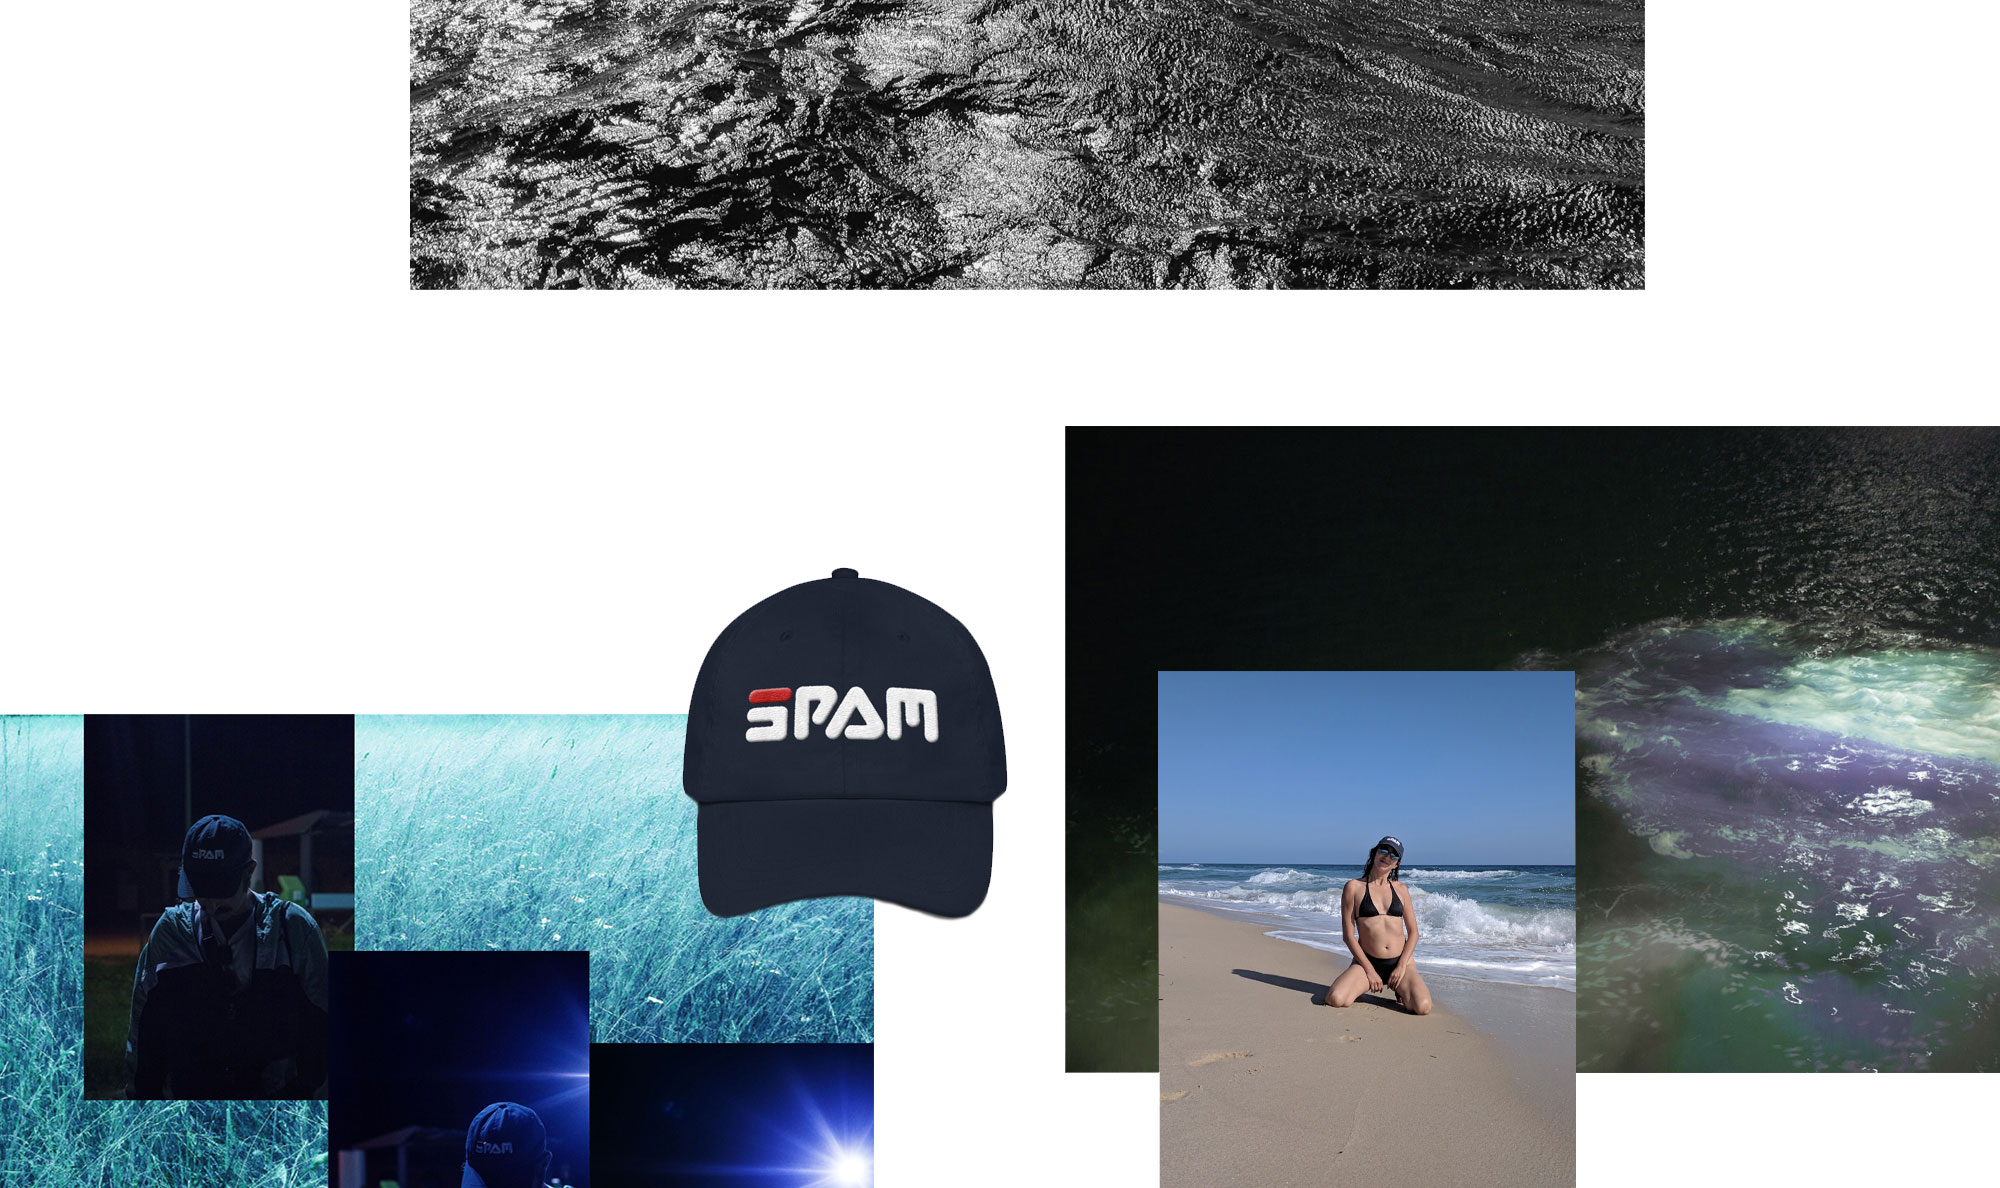 Original Spam Cap on beach